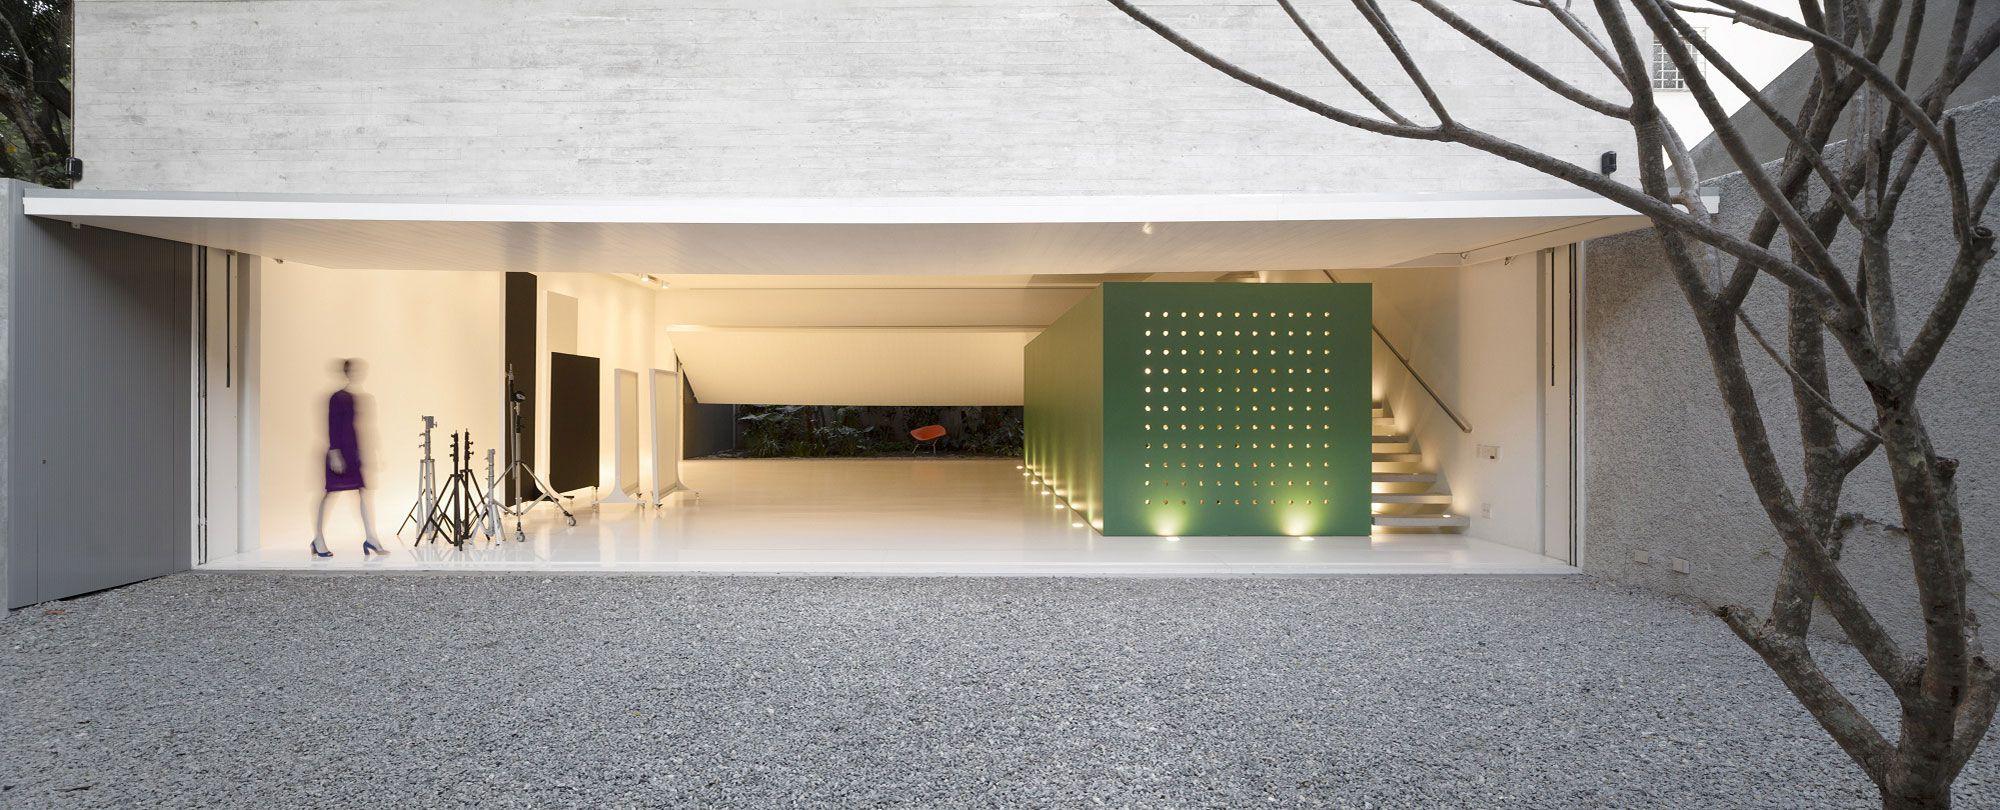 Studio-R-10